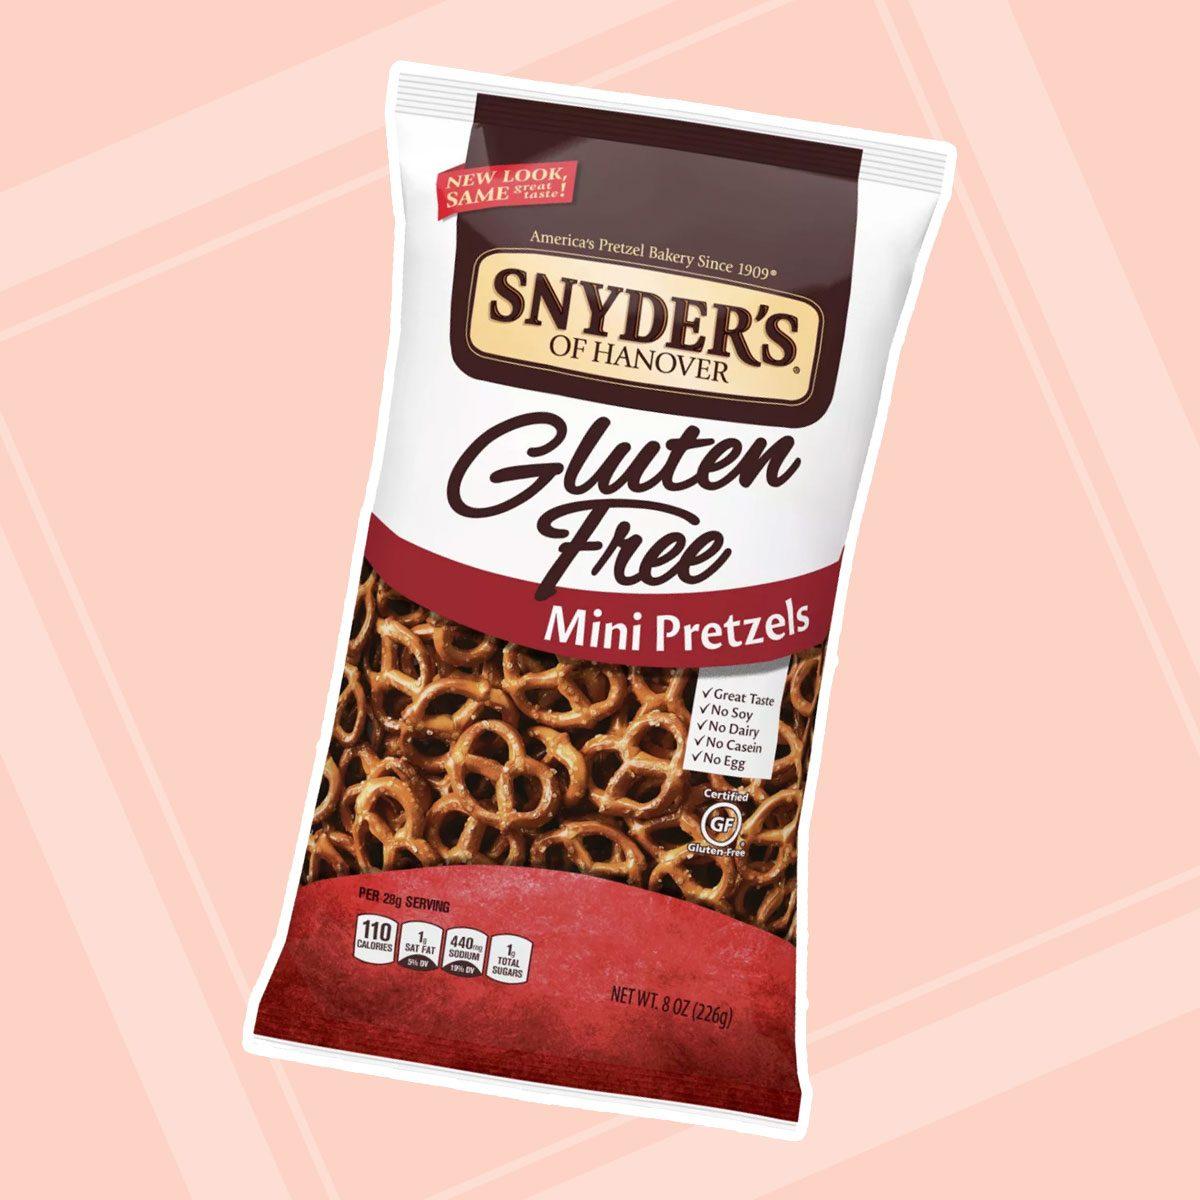 Snyders Gluten-Free Mini Pretzels